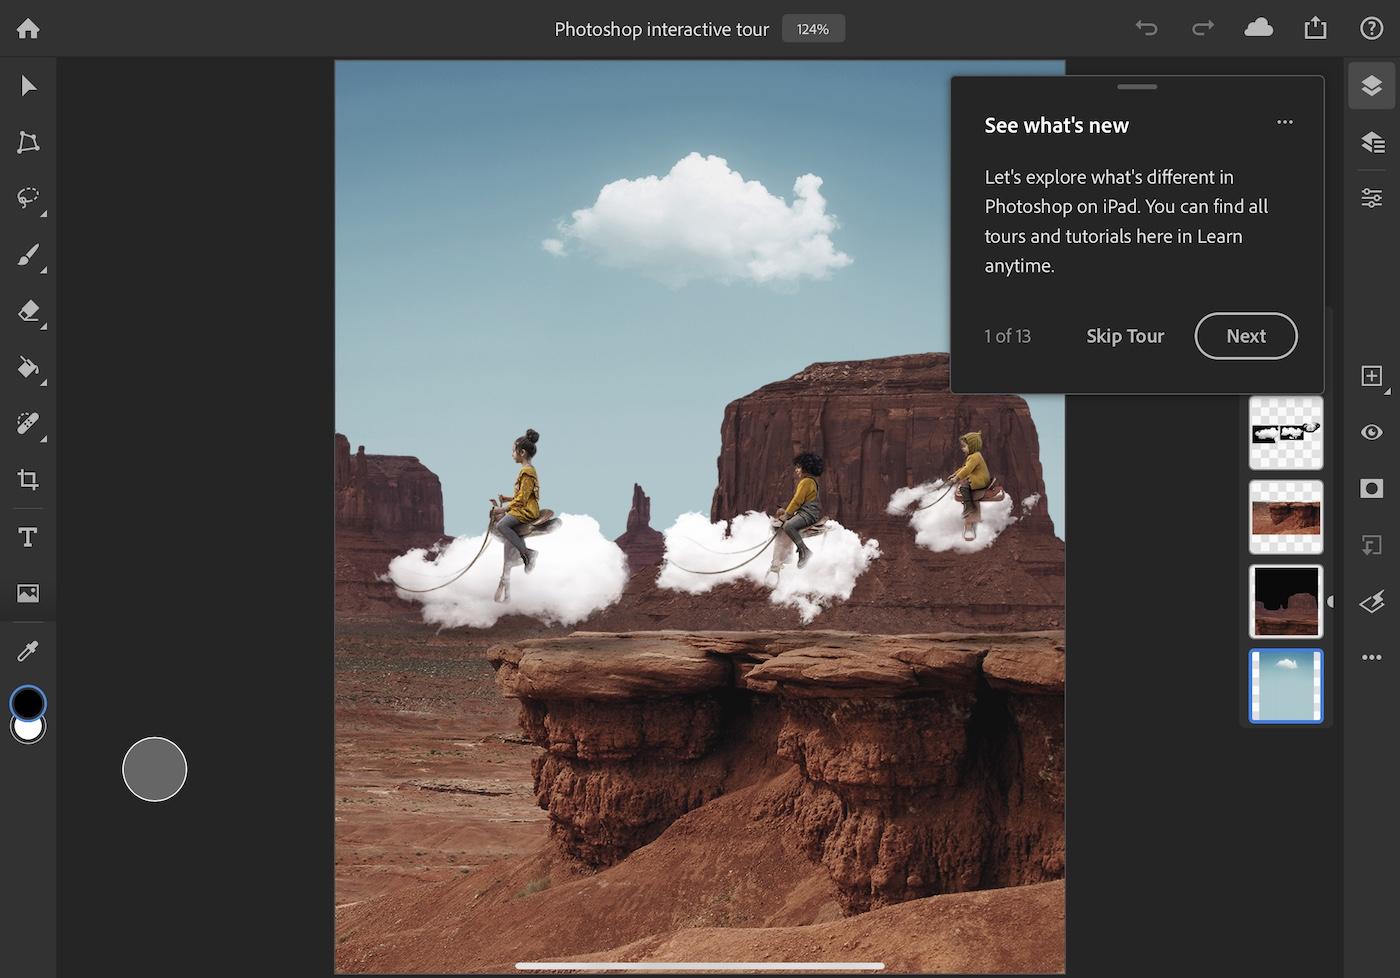 Photoshop for iPad 3